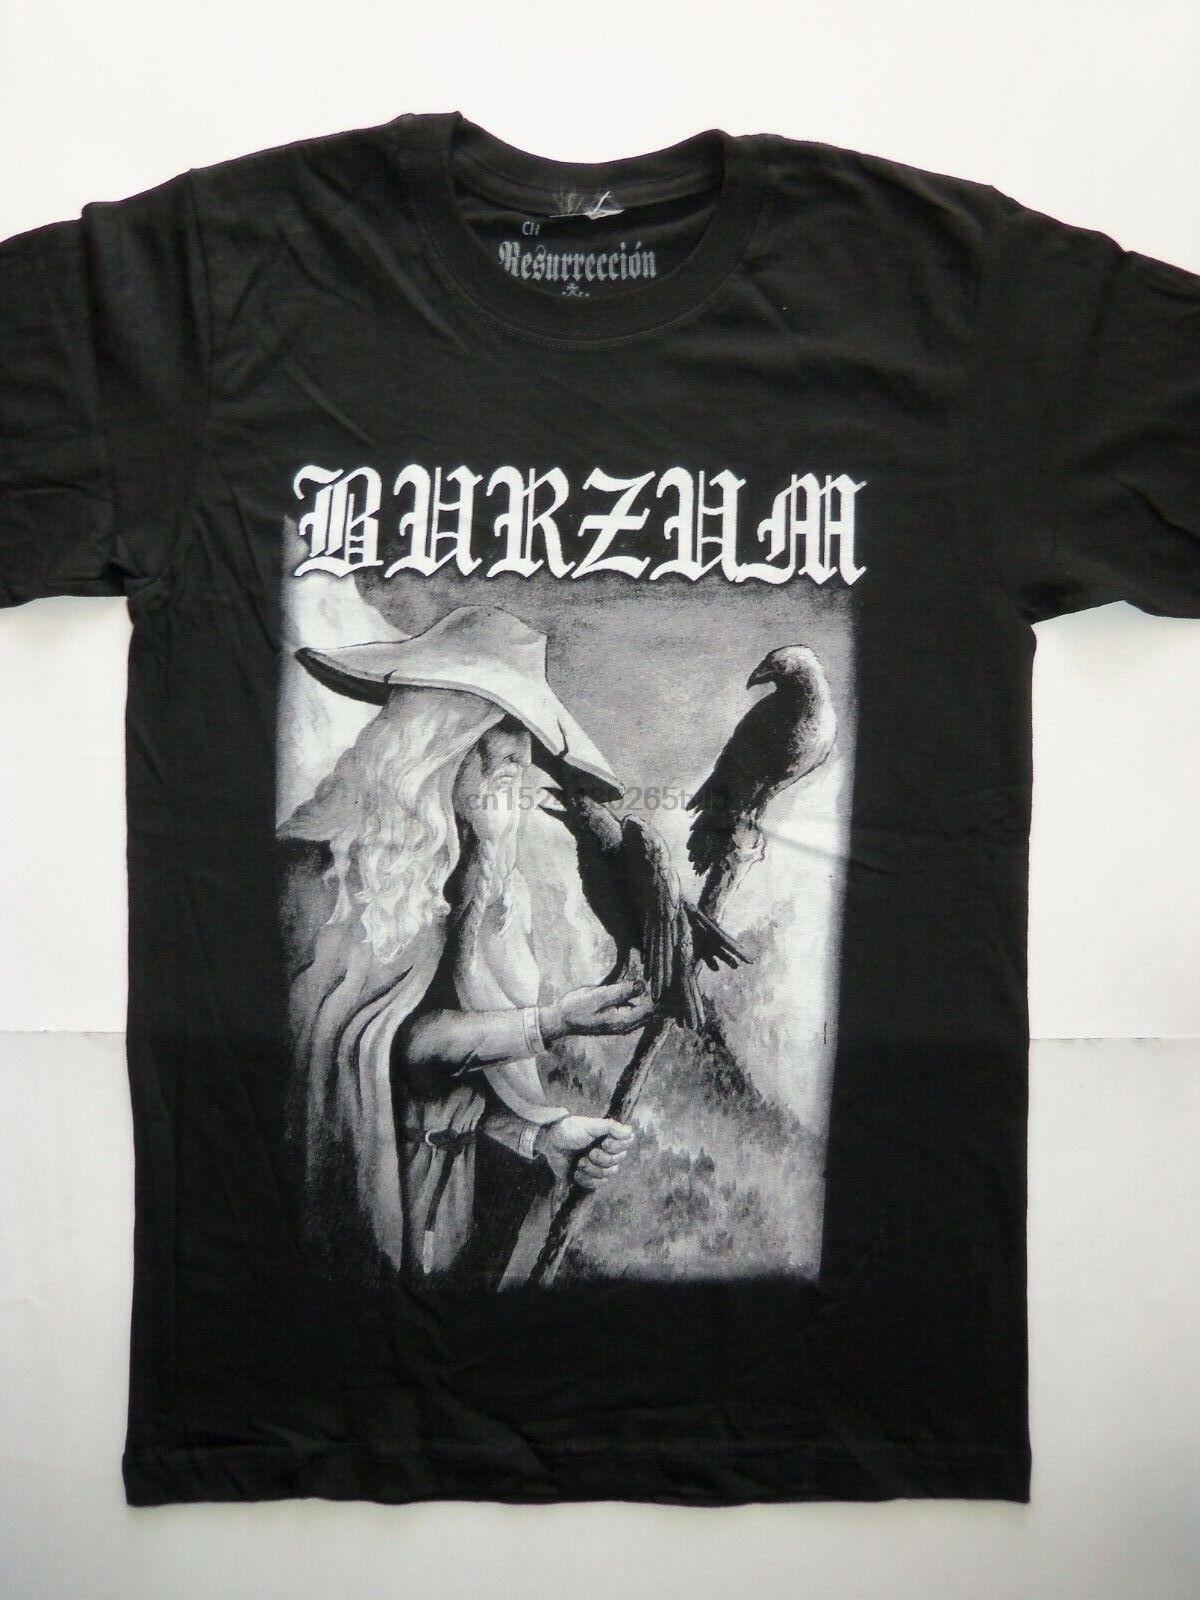 1burzum camiseta escuro funeral darkthrone mayhem imperador bathory filosofem aske